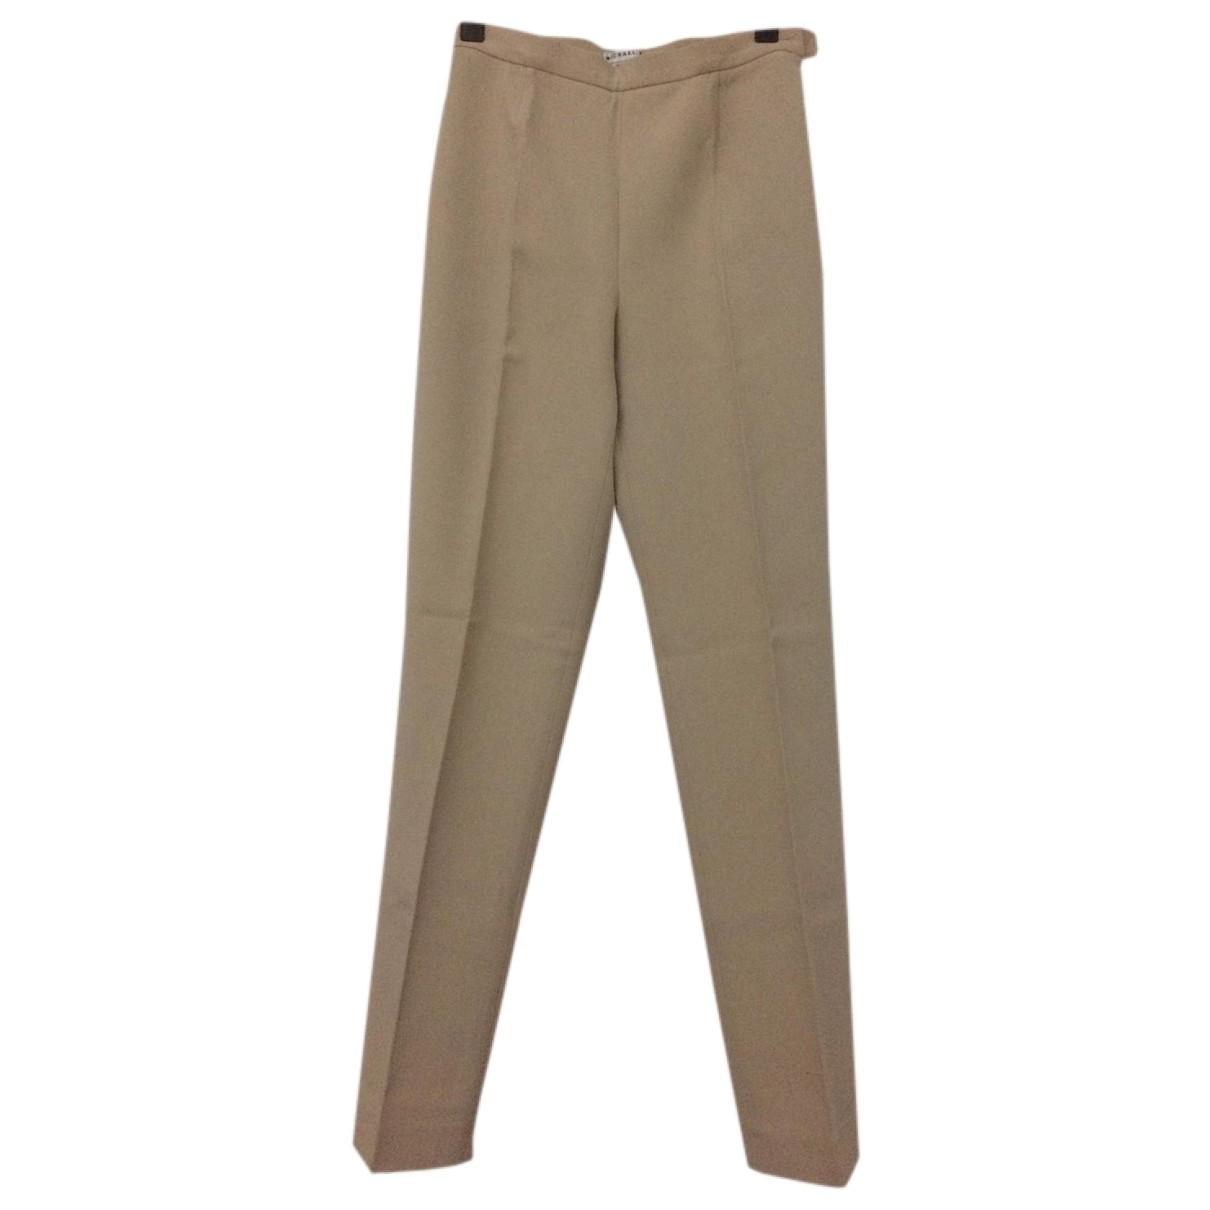 Michael Kors \N Camel Wool Trousers for Women 4 US